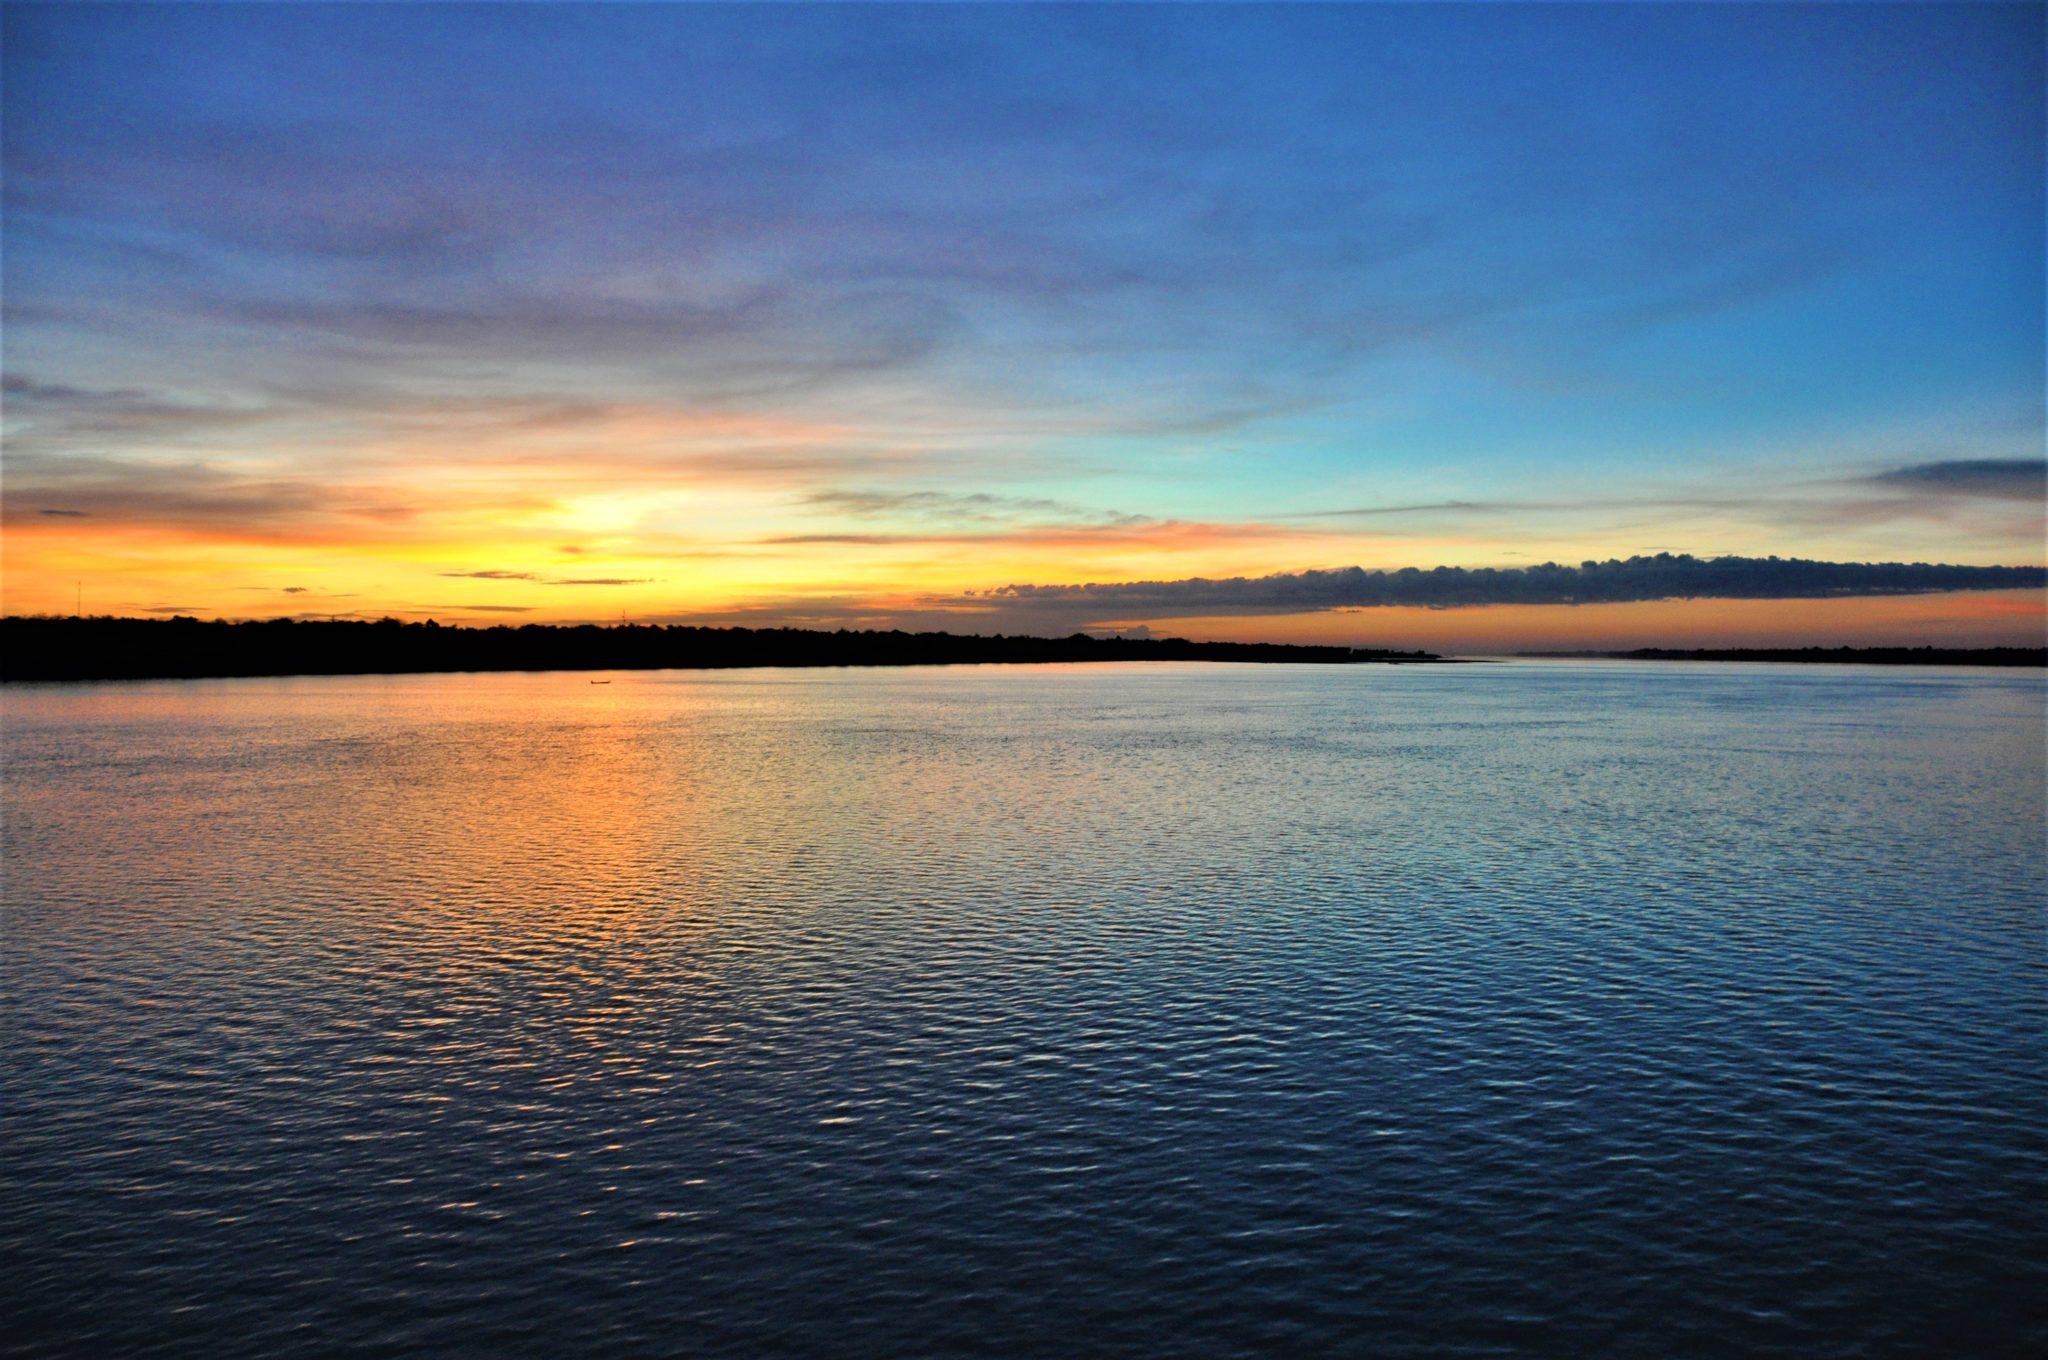 Tonle Sap Sunset